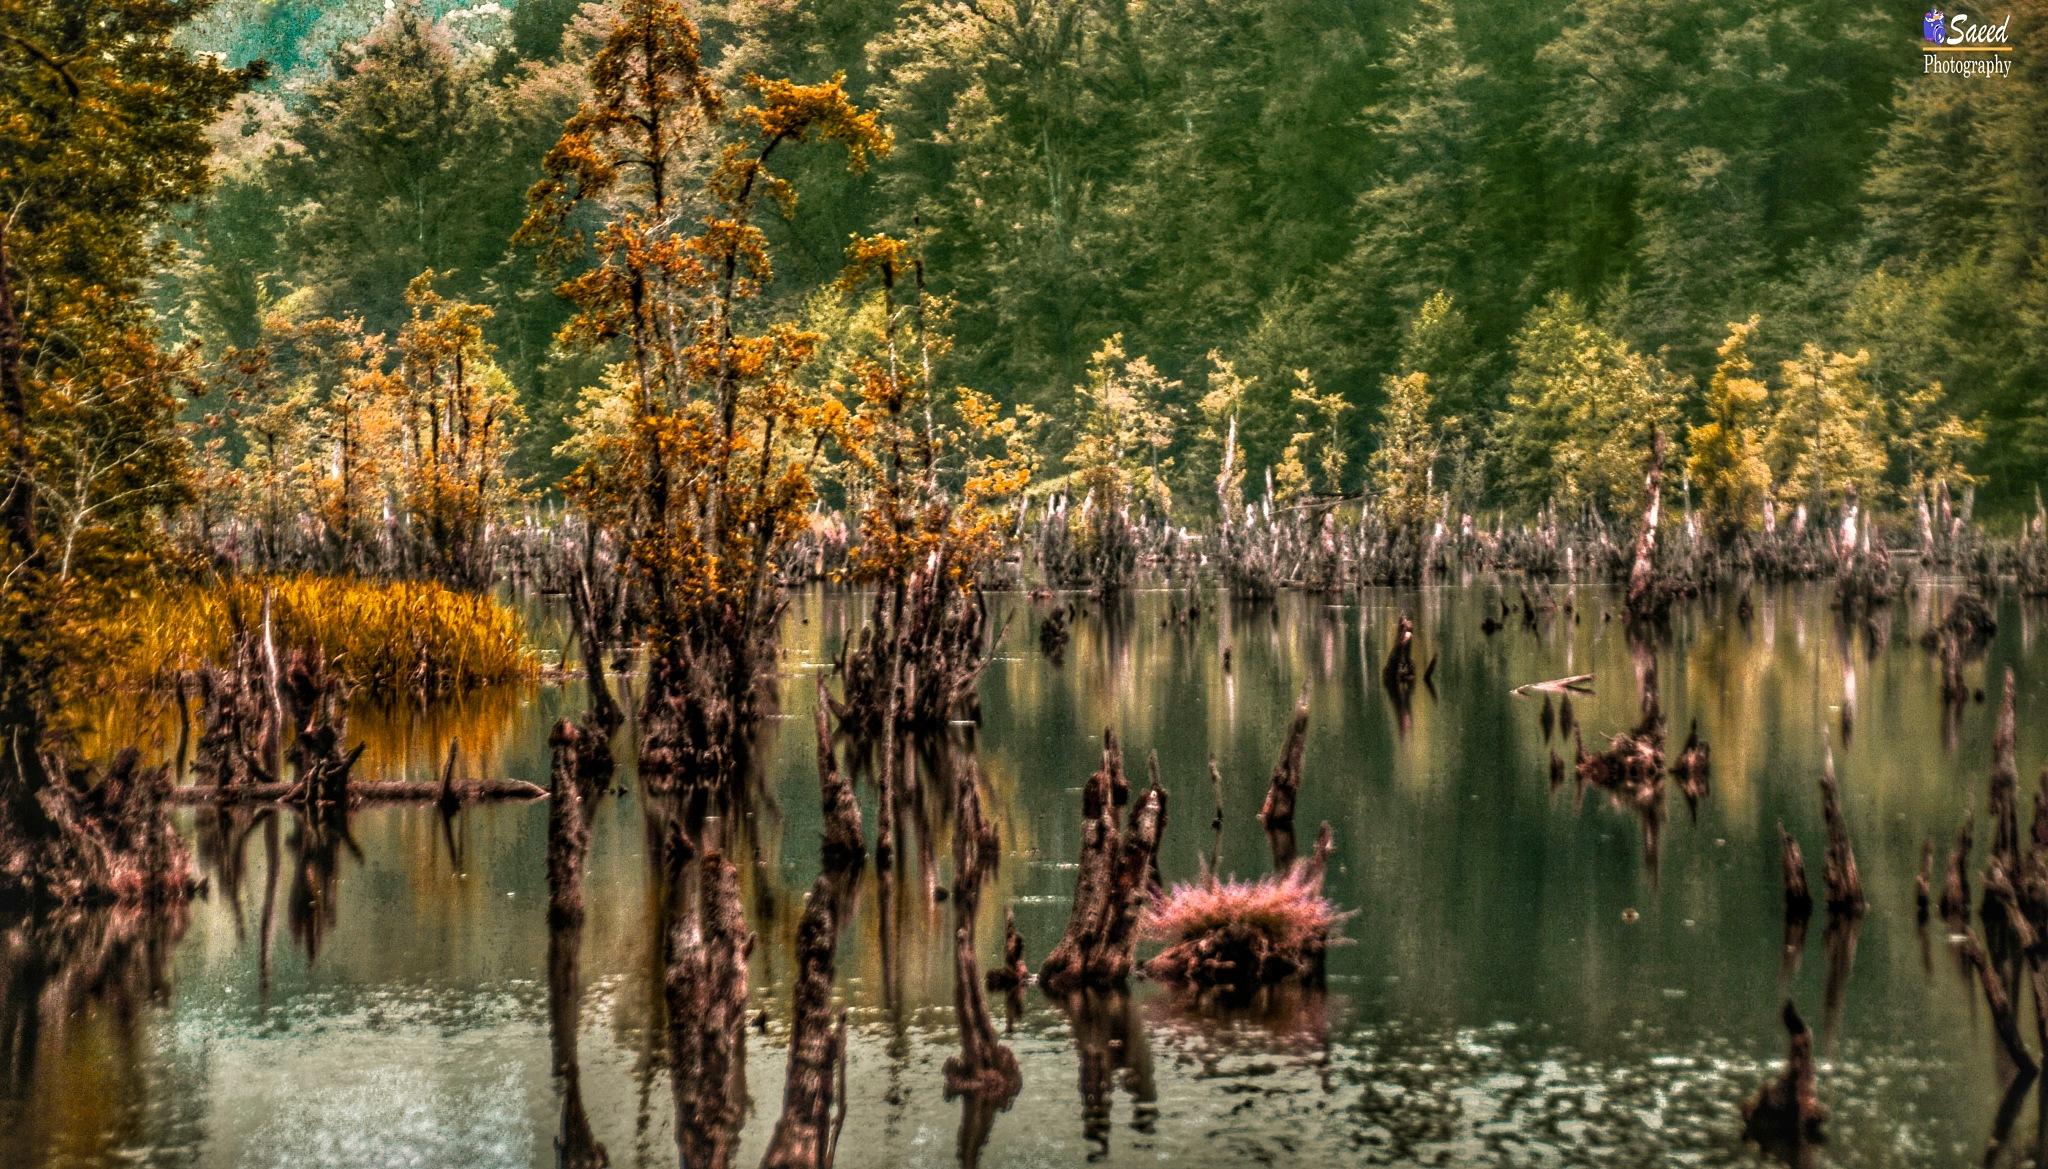 Wetlands Spirits by Saeed Khansarian